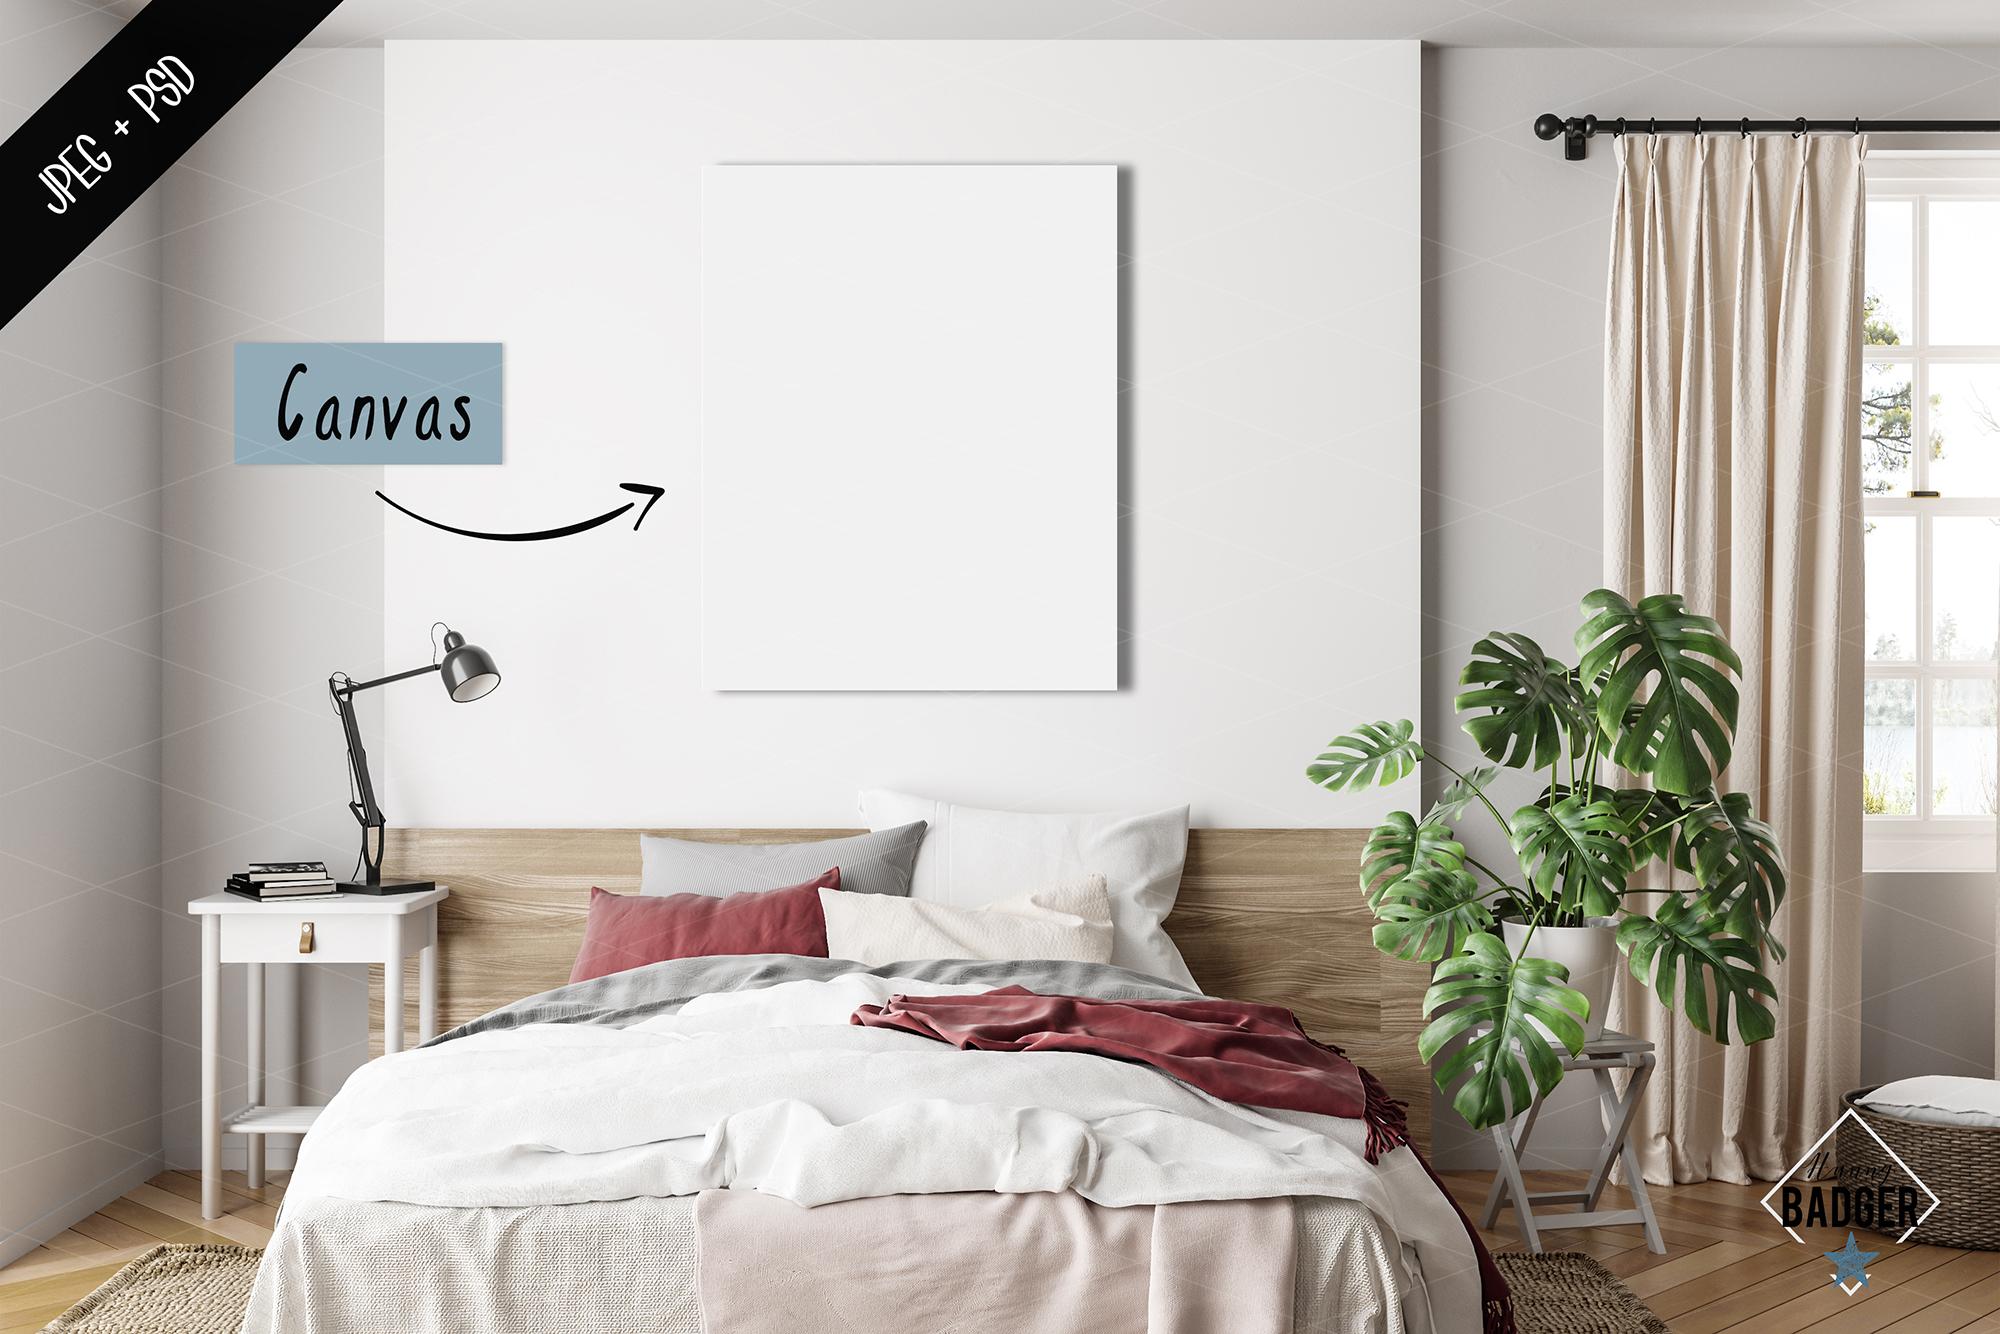 Interior mockup BUNDLE - frame & wall mockup creator example image 4